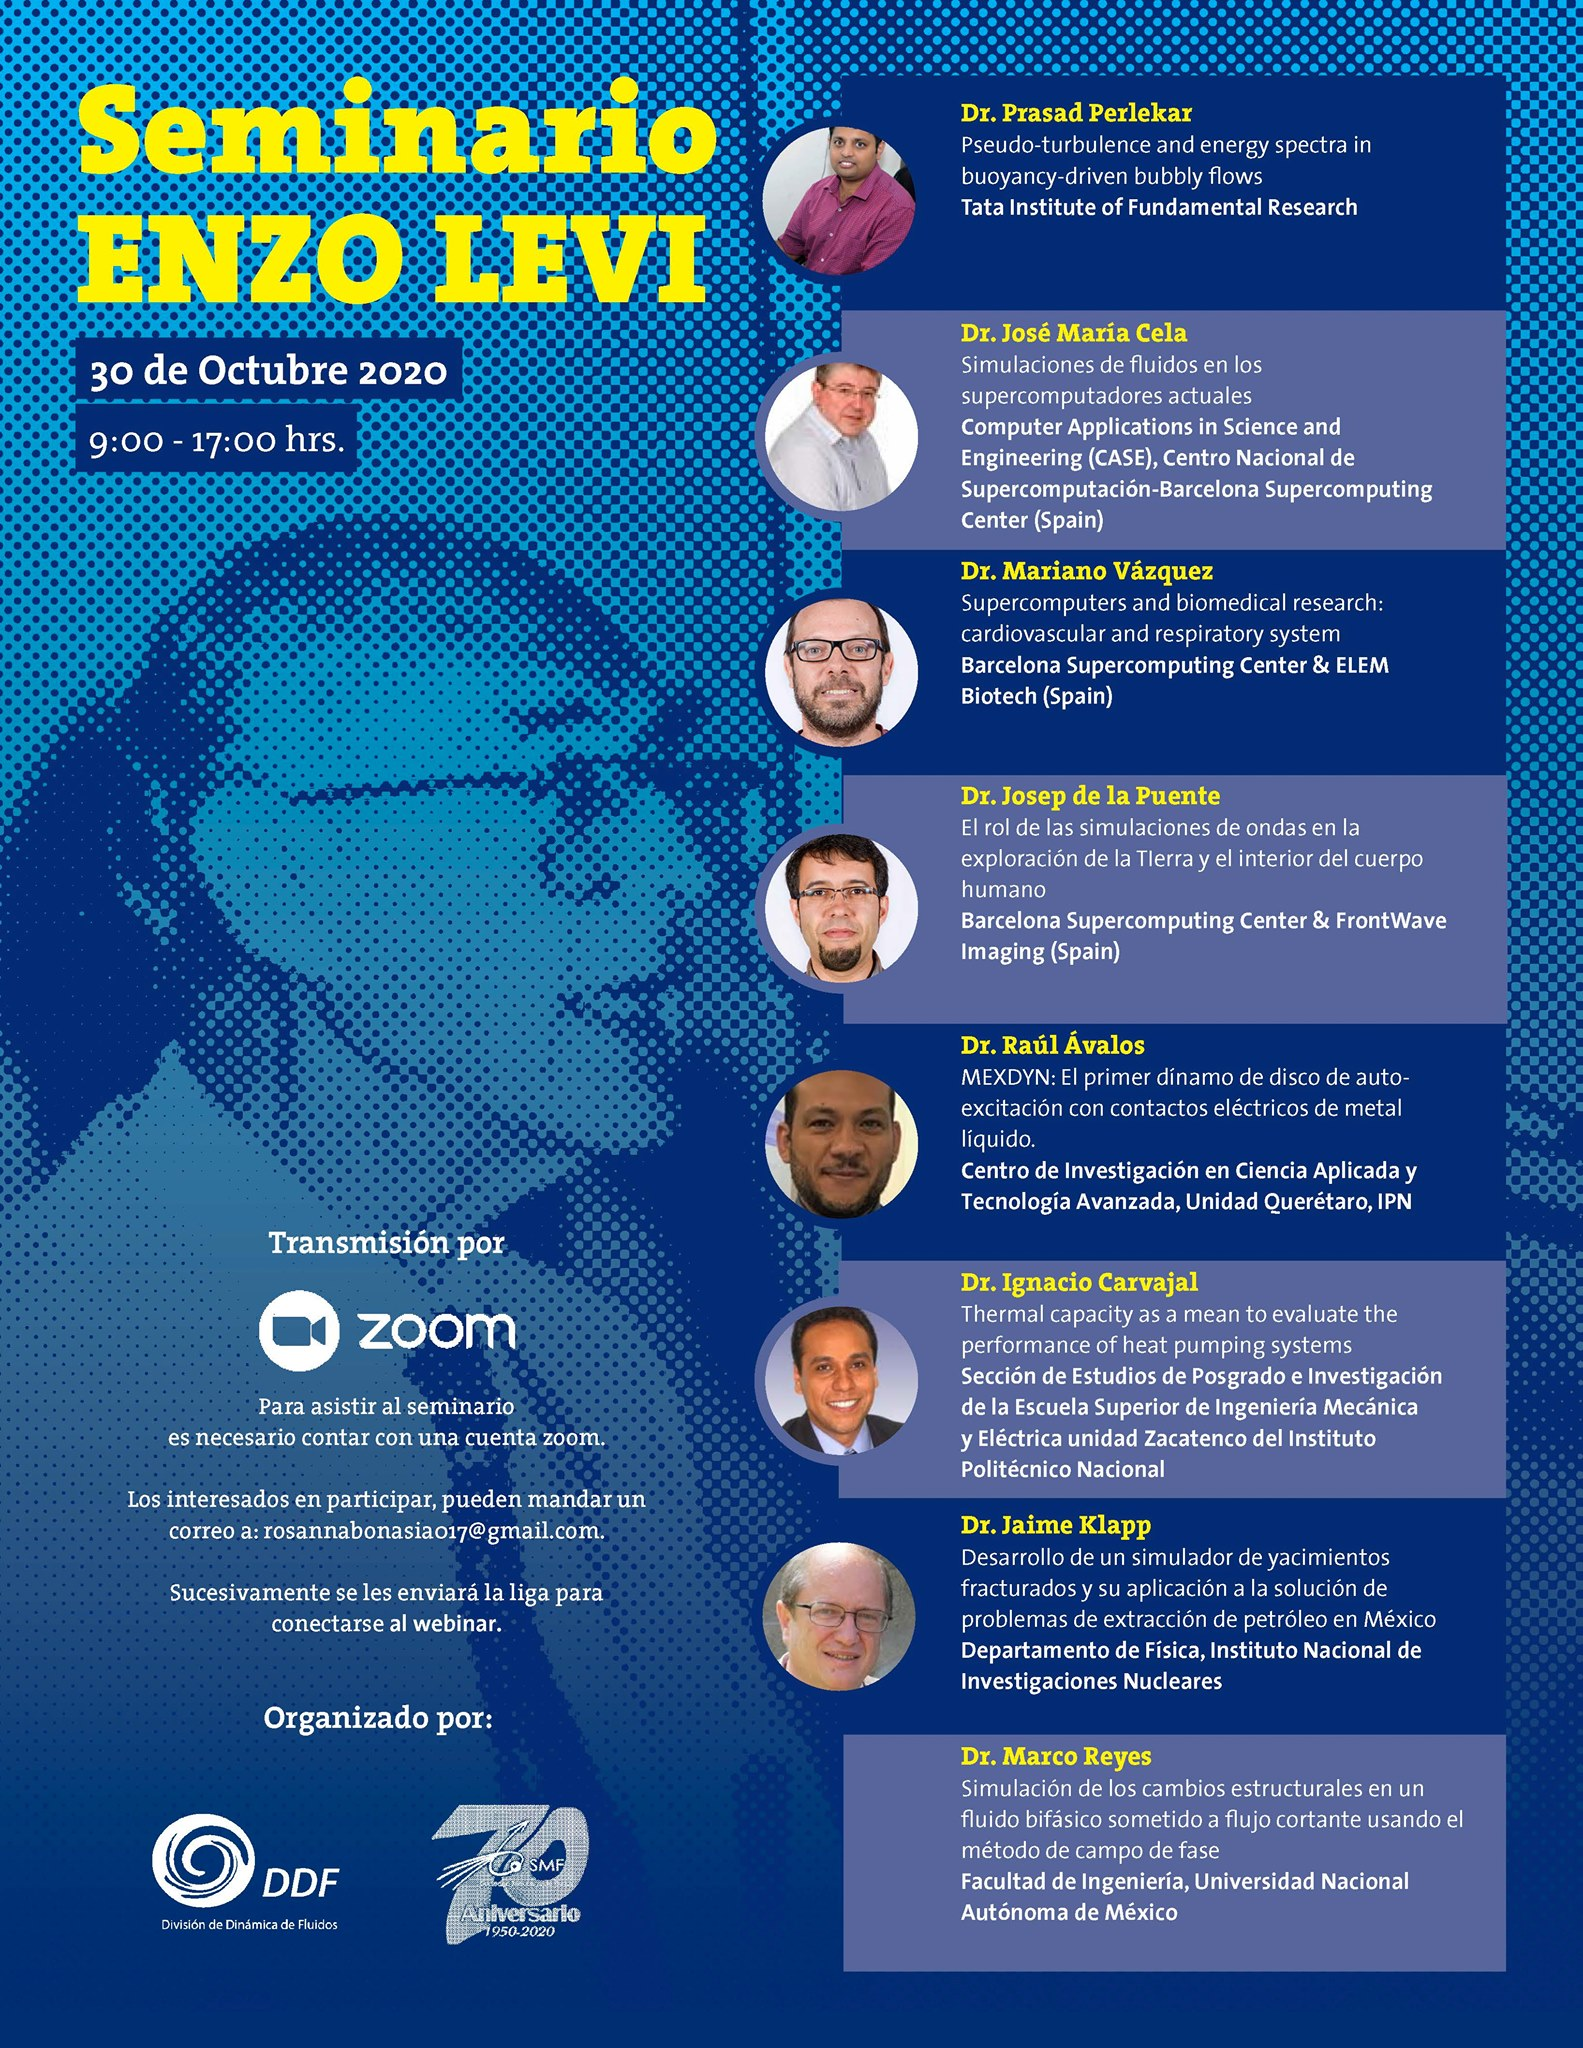 Seminario Enzo Levi